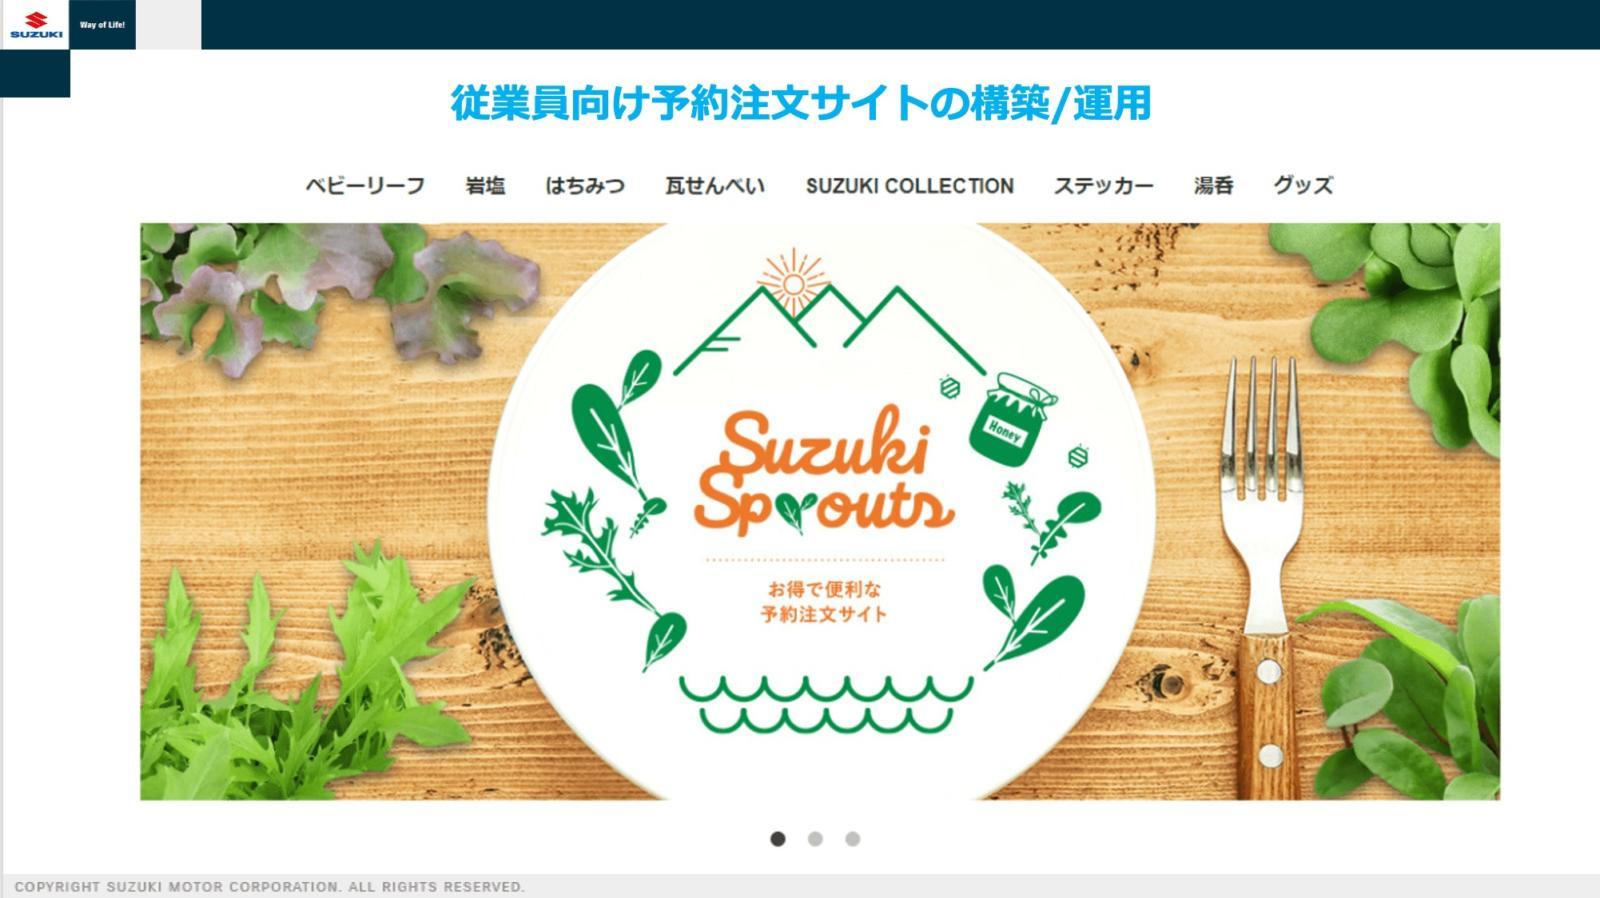 SUZUKI様_従業員向け予約注文サイトの構築・運用